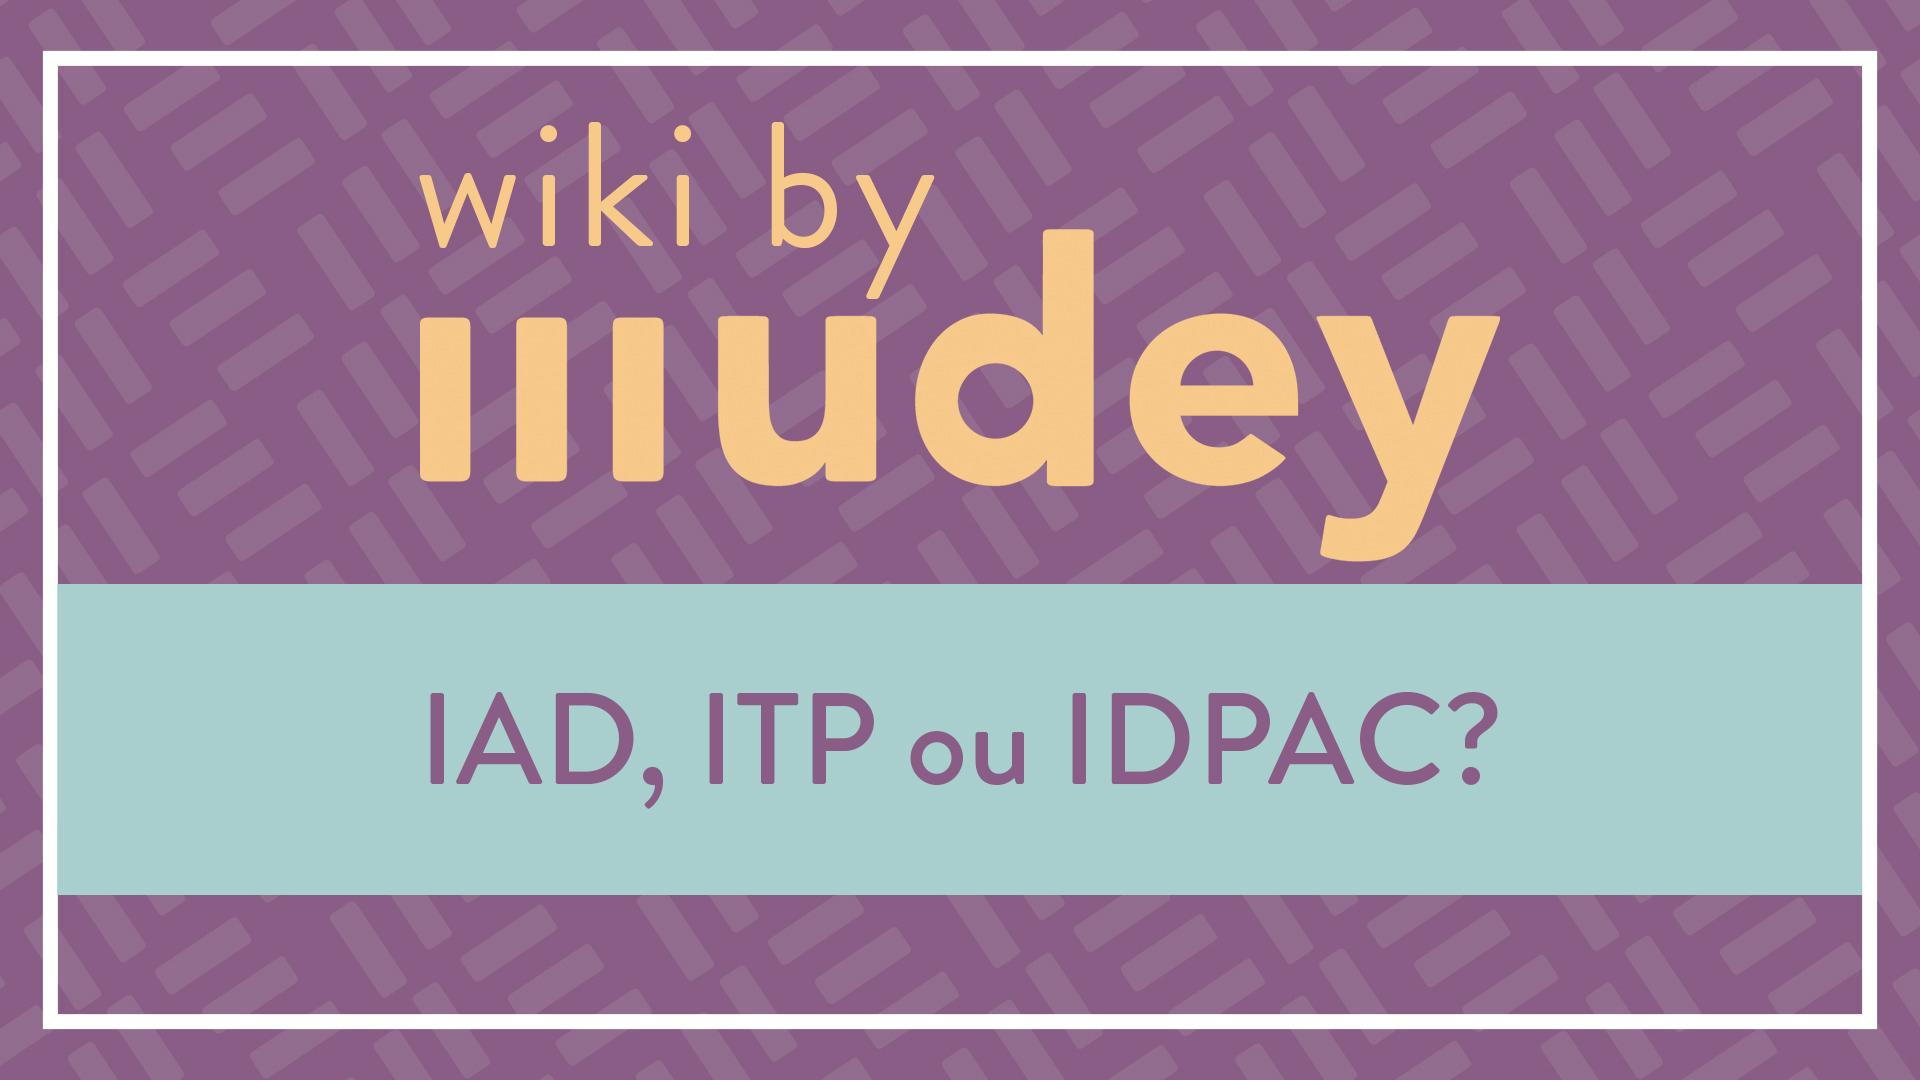 seguro vida incapacidades invalidez IAD ITP IDPAC